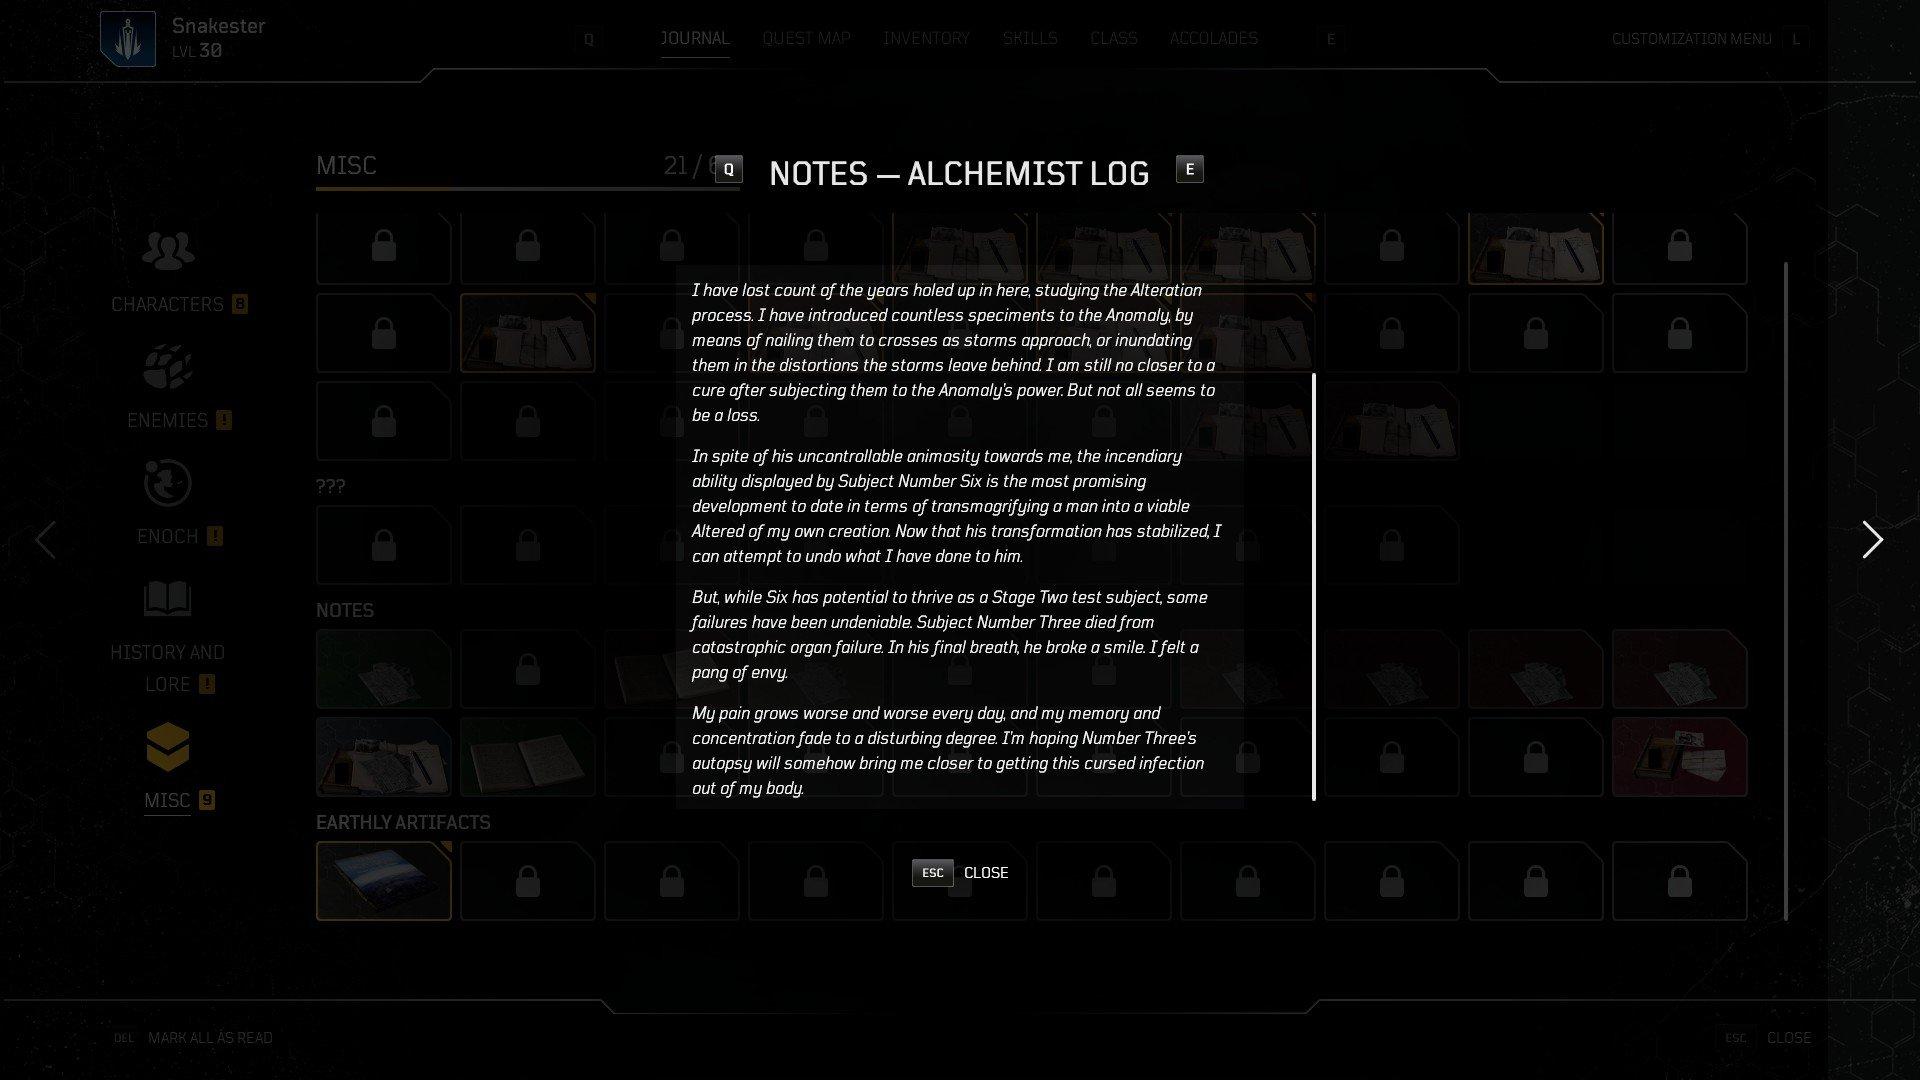 Outriders - Alchemist Journal 2